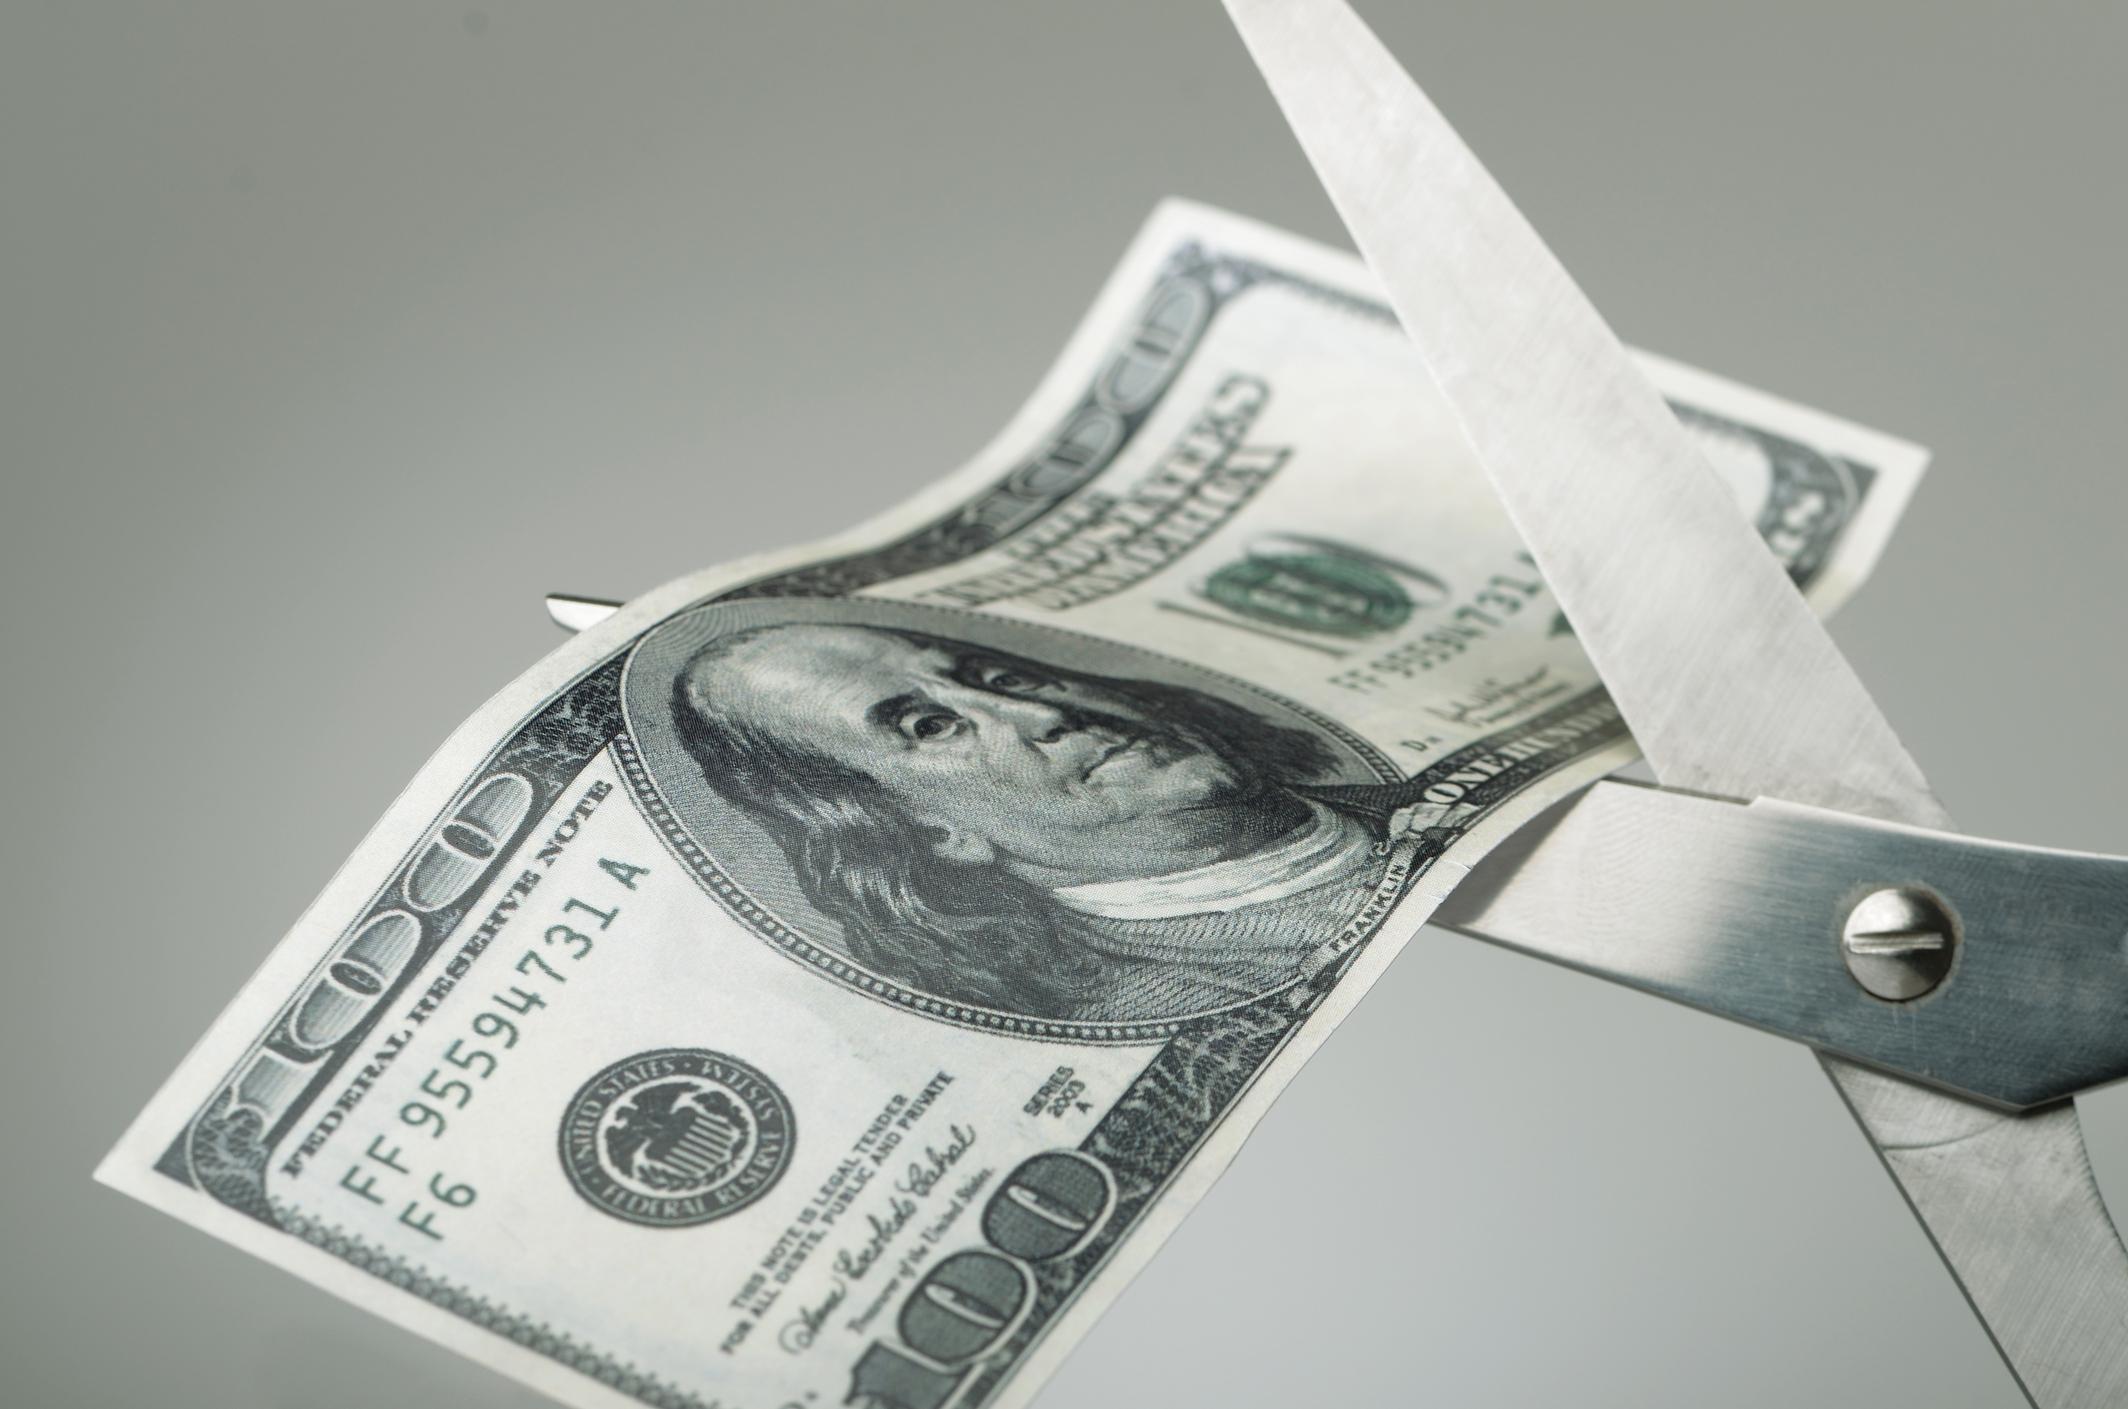 Pair of scissors cutting a $100 bill